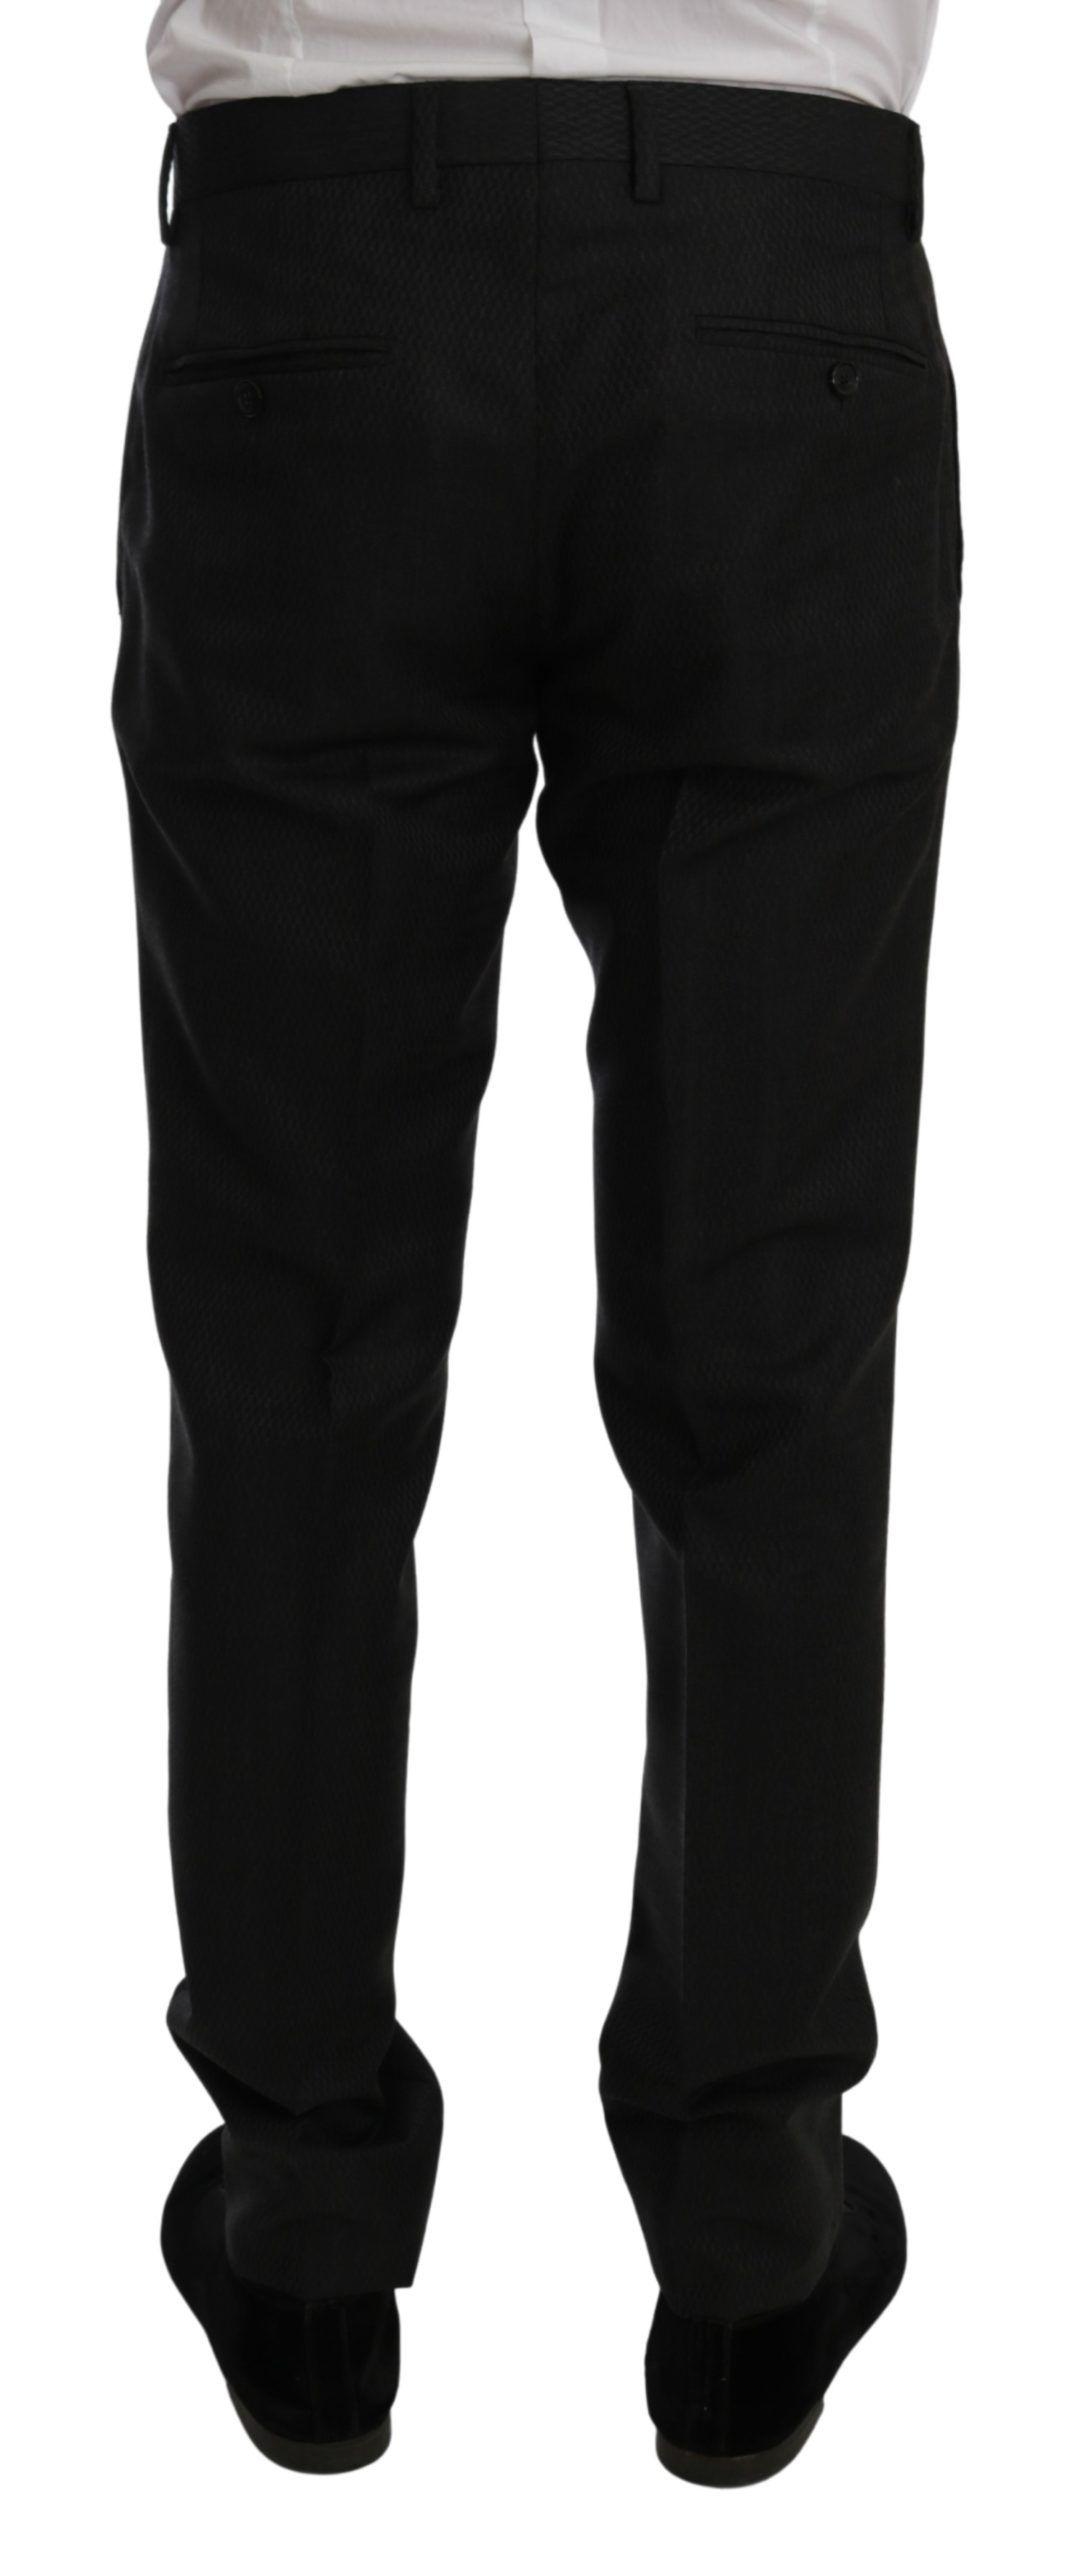 Roberto Cavalli Pink Black Lace Strap Underwear Blouse Top